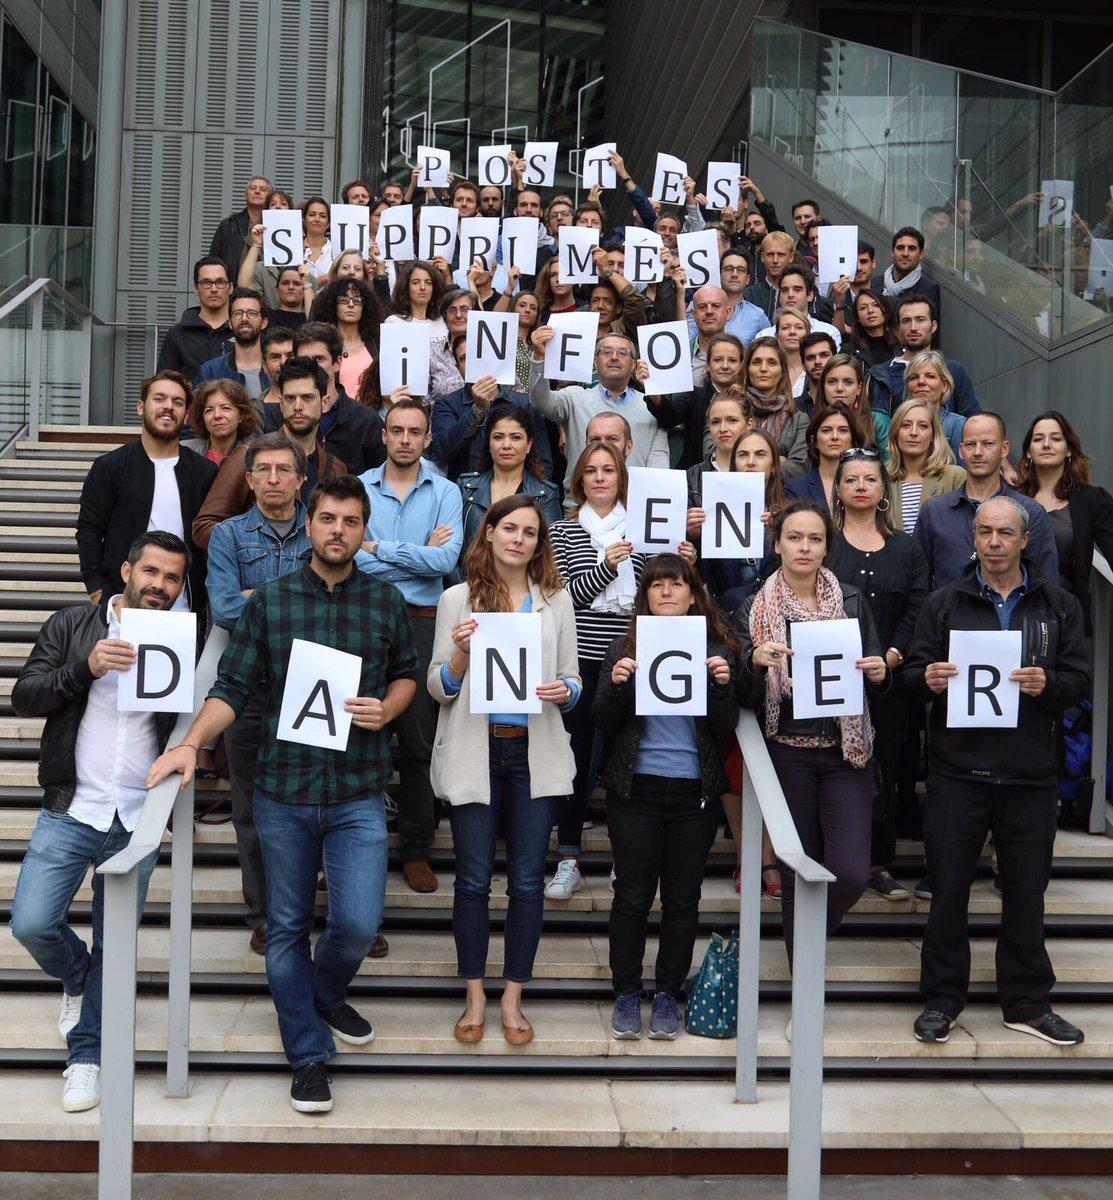 Grève inédite @France2tv @EnvoyeSpecial @Cdenquete @Francetele #infoen...